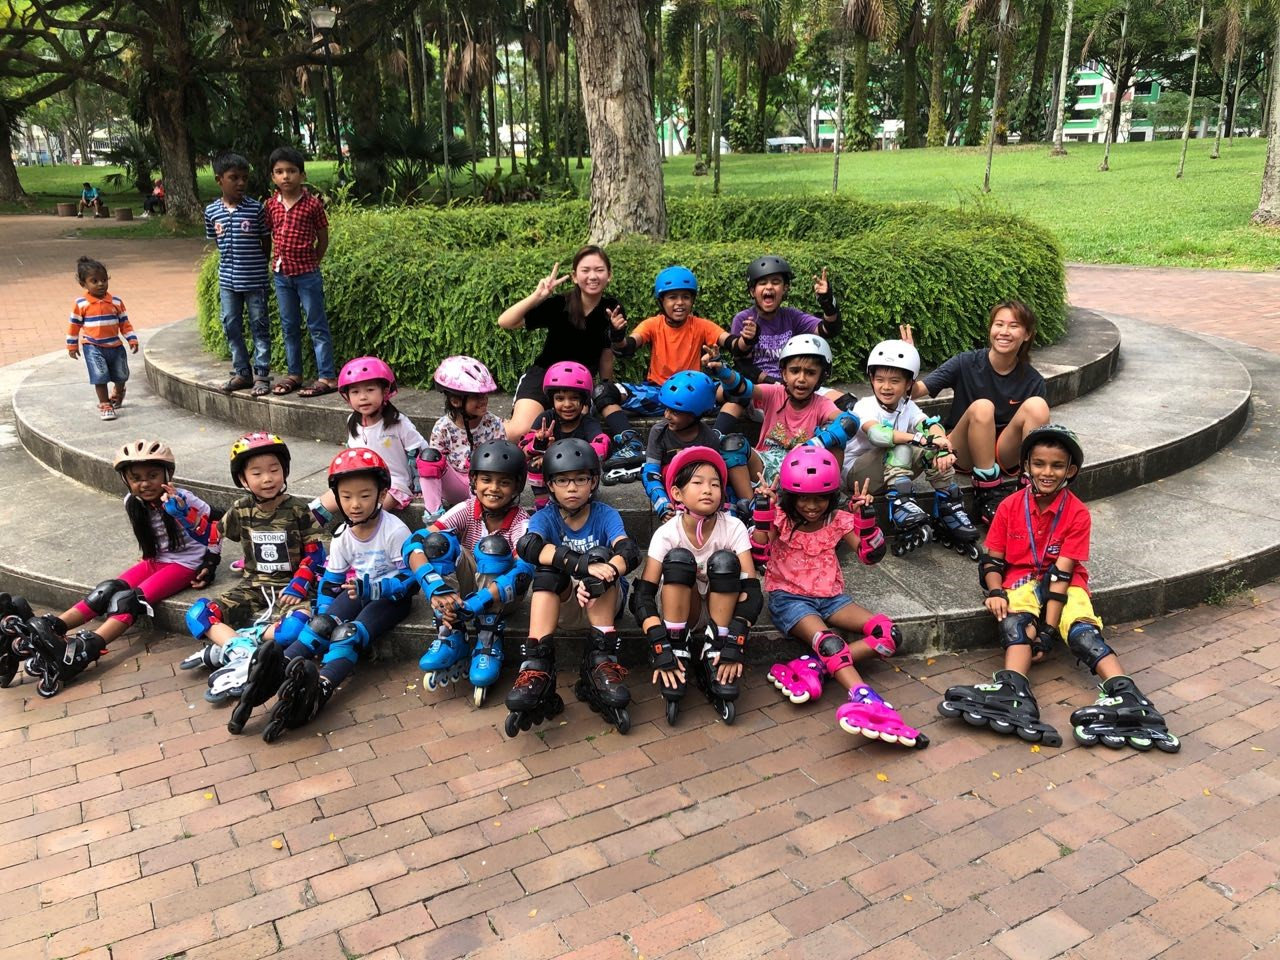 Punggol Park Skating Lesson Package